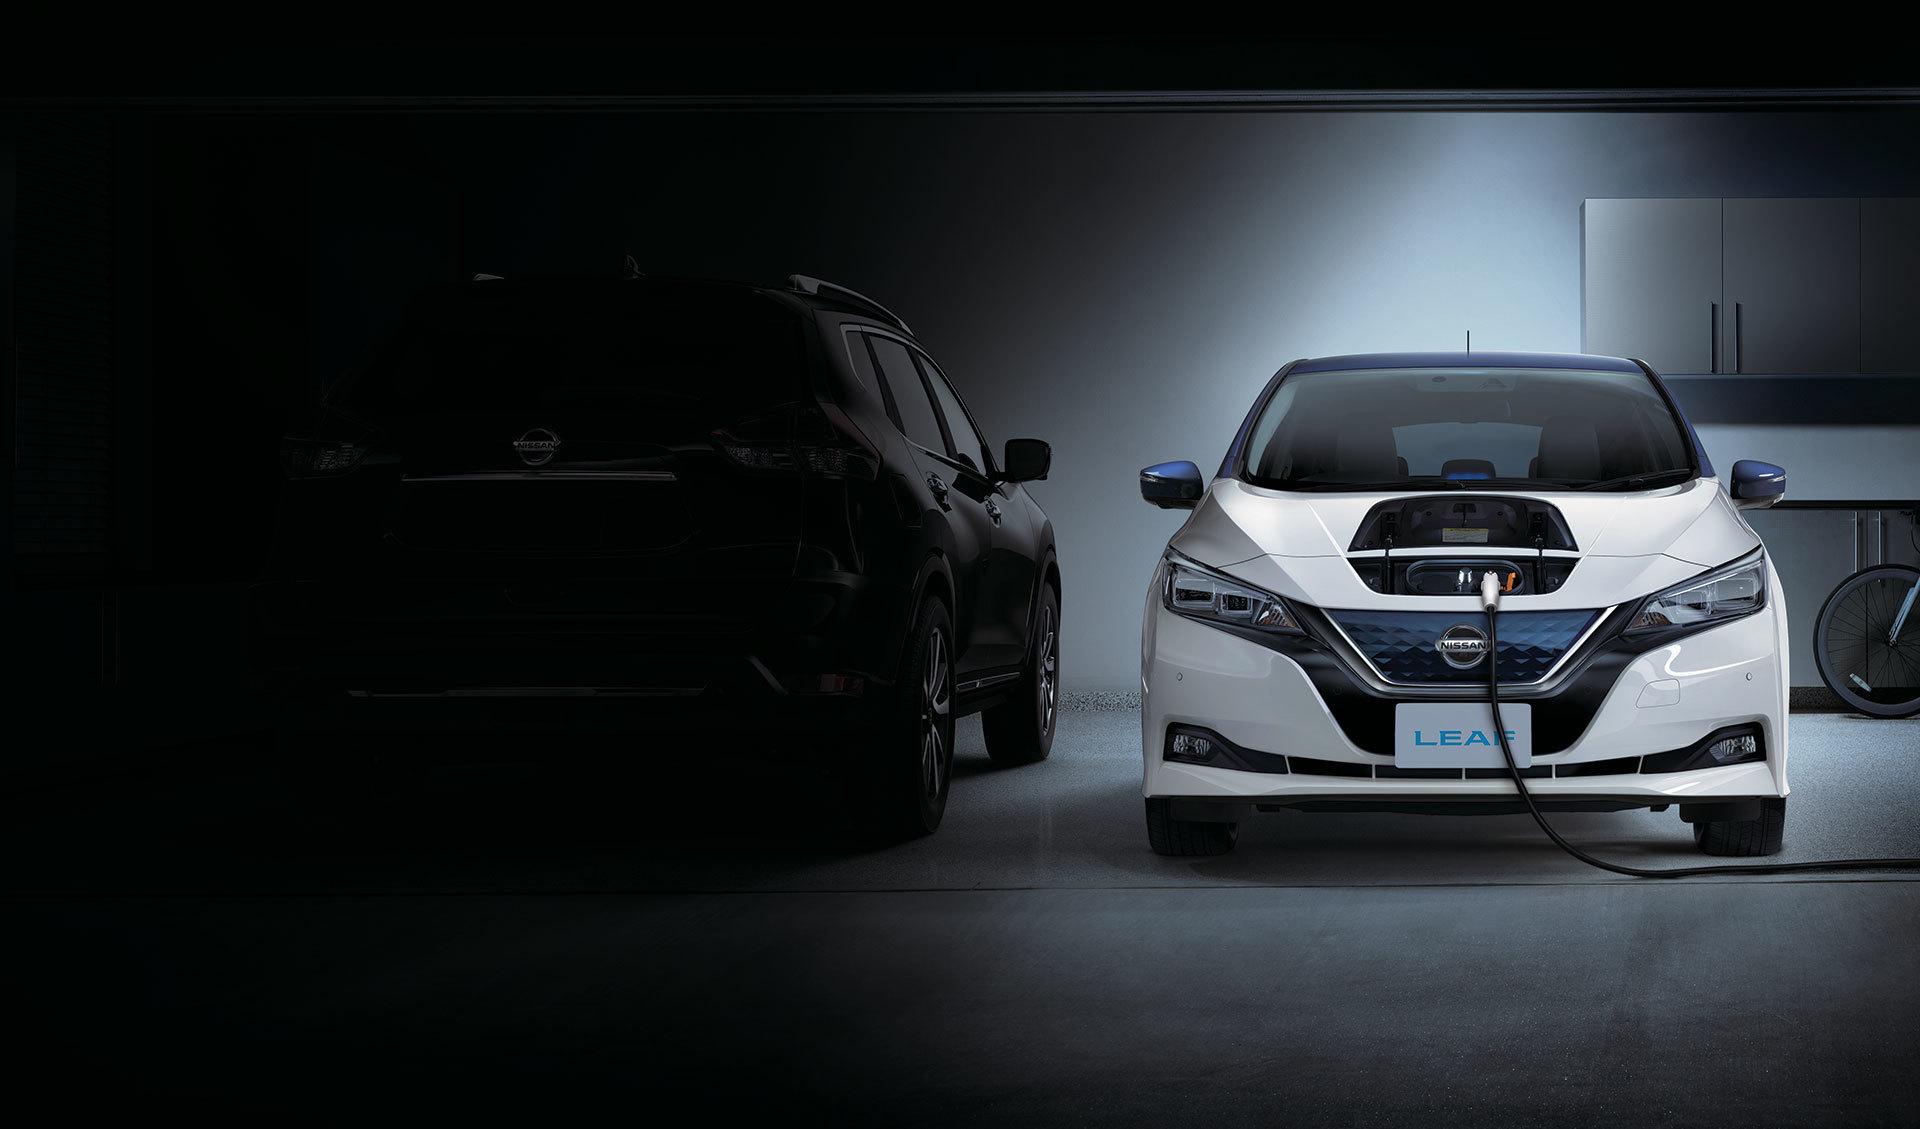 Emisiones Diesel Gasolina 2035 Nissan Leaf Coche Electrico